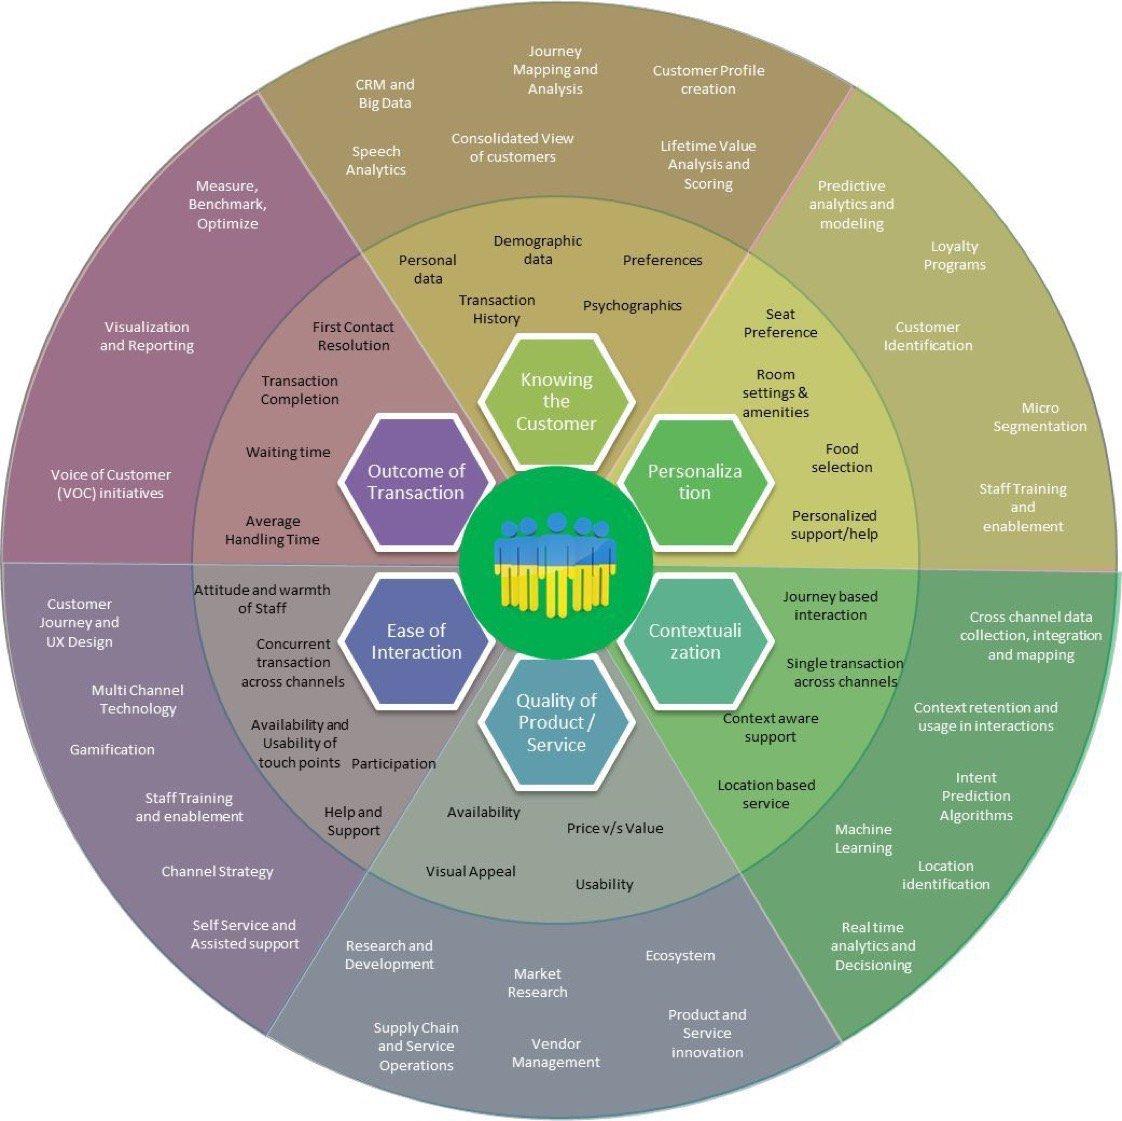 [ #CX ]  The 6 pieces of the Customer eXperience puzzle #infographic   #DigitalMarketing #insight #Cognitive #Predictive #UX #CX  #fintech #insurtech #Finserv #SmartCity  #BigData #Tech #AI #IOT #Digital #DigitalTransformation<br>http://pic.twitter.com/vYWSjMKmHc